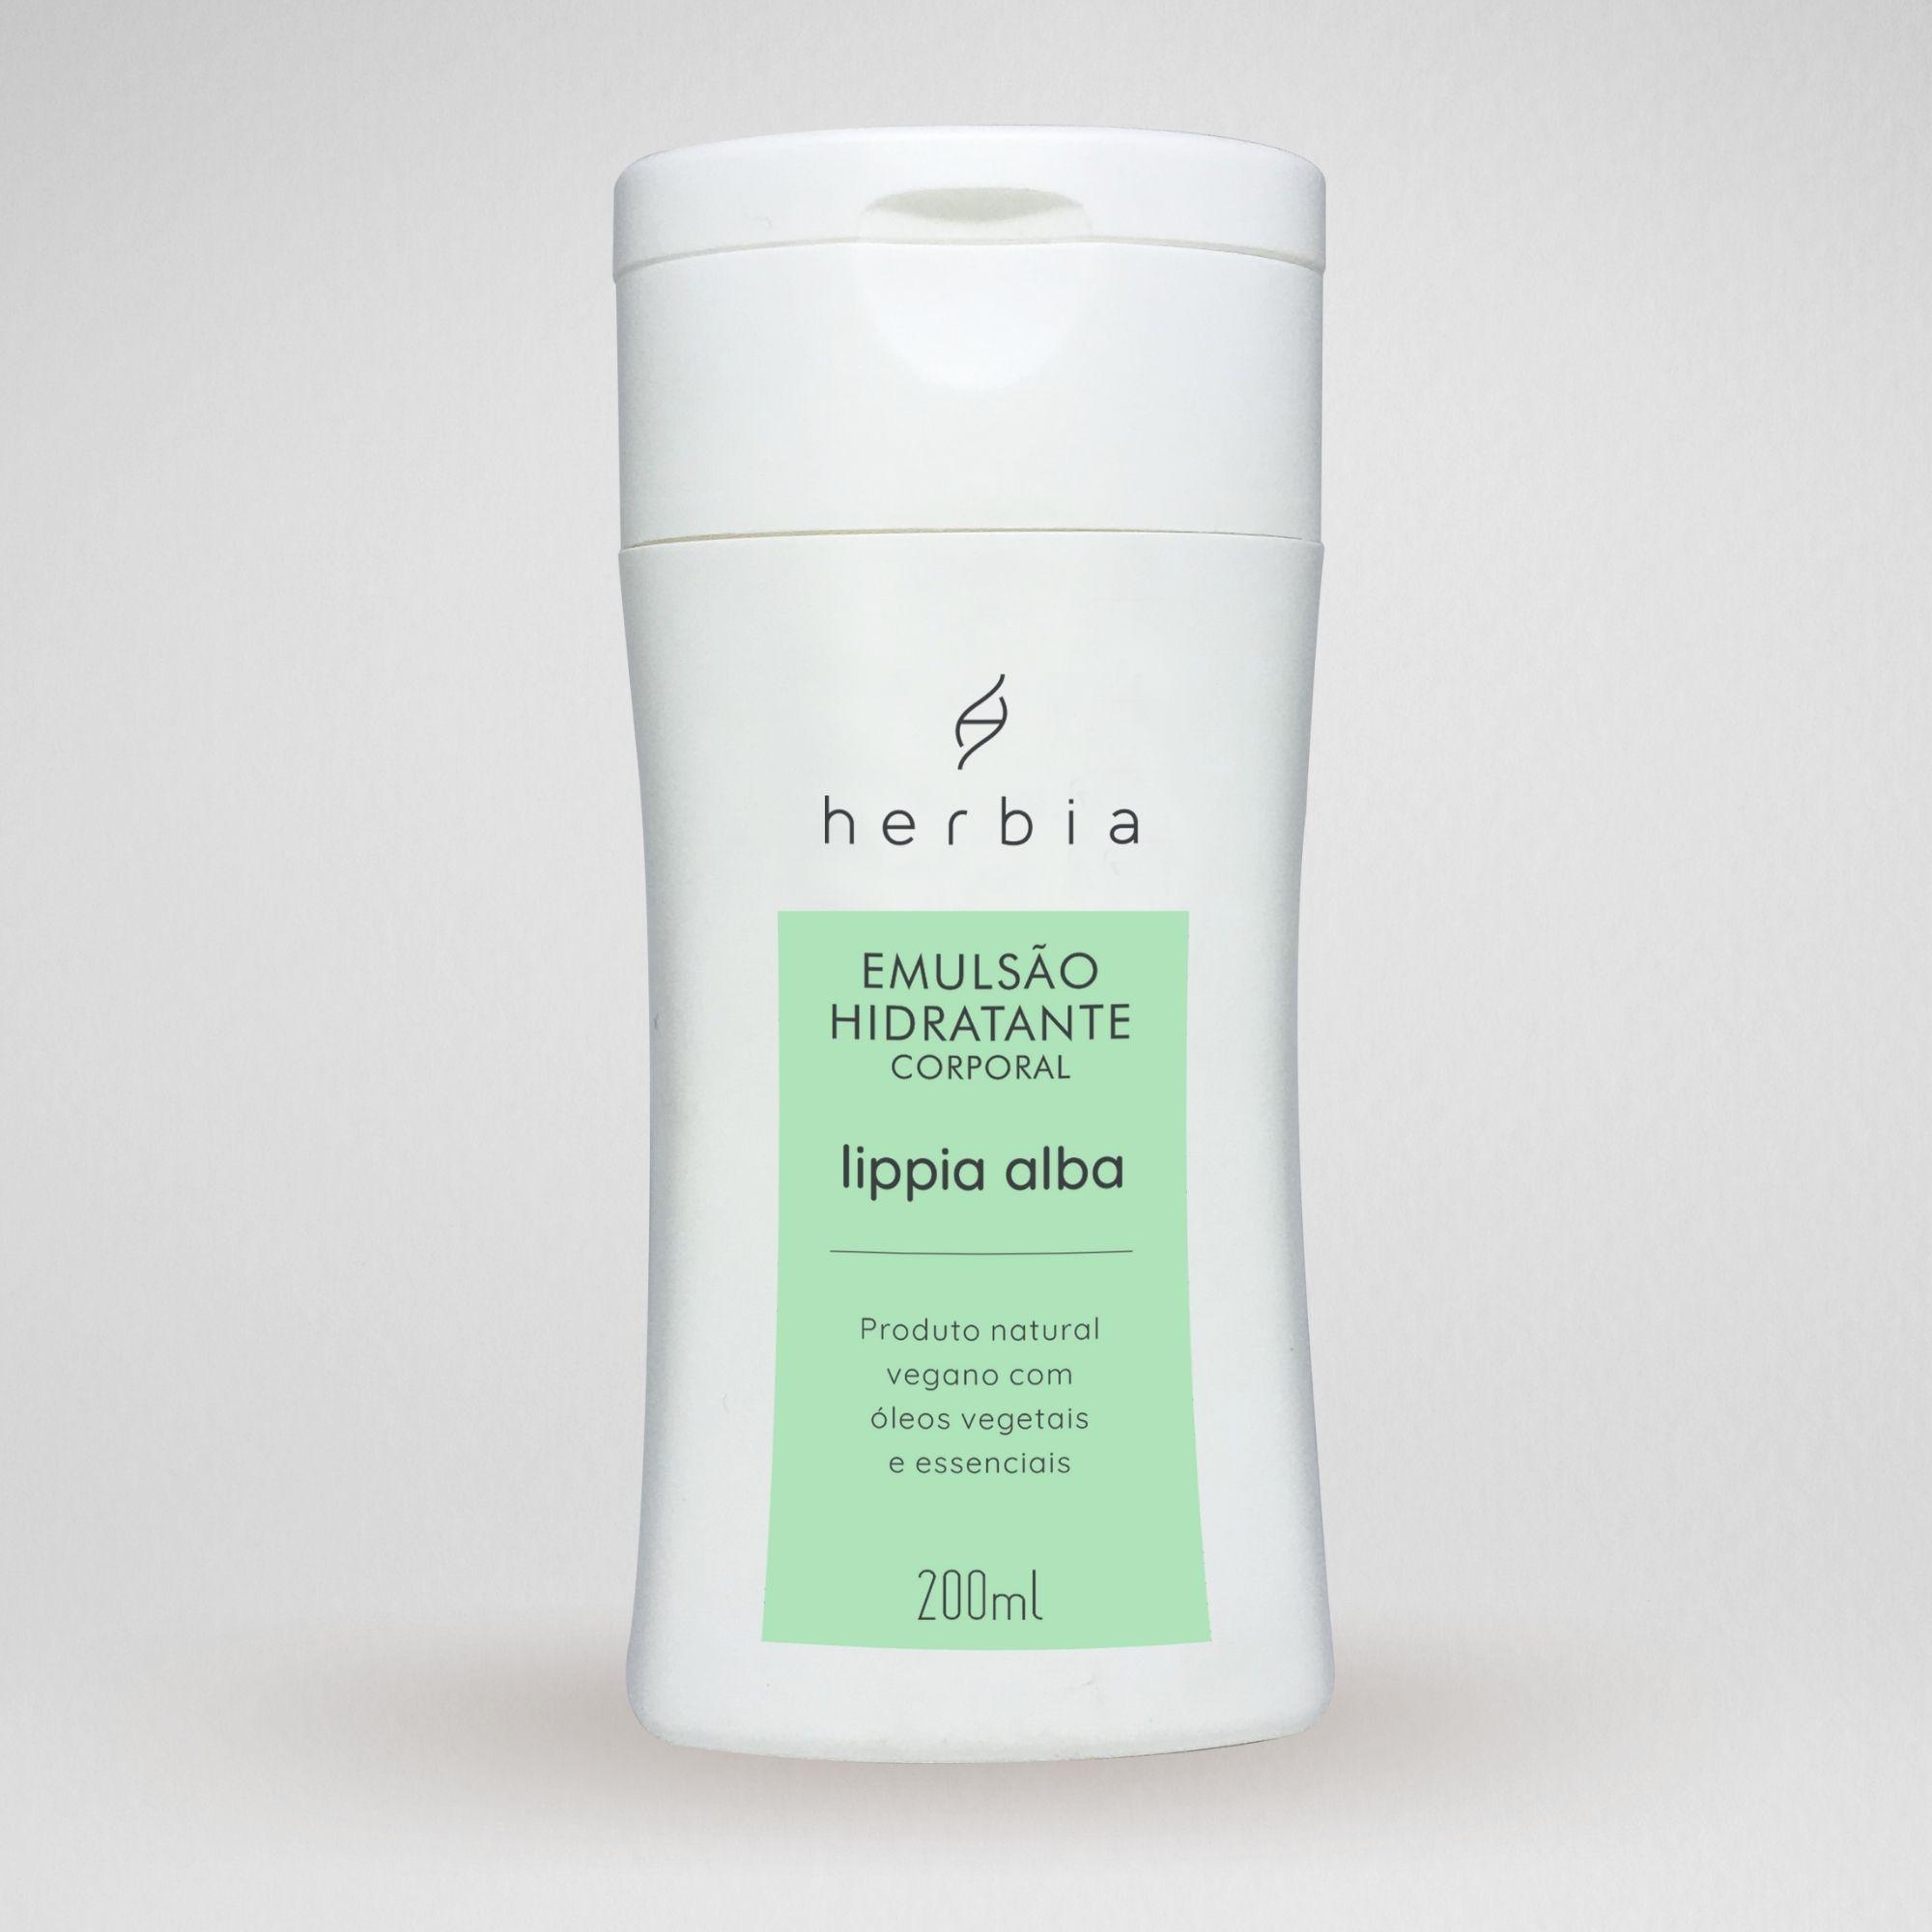 Emulsão Hidratante Lippia Alba